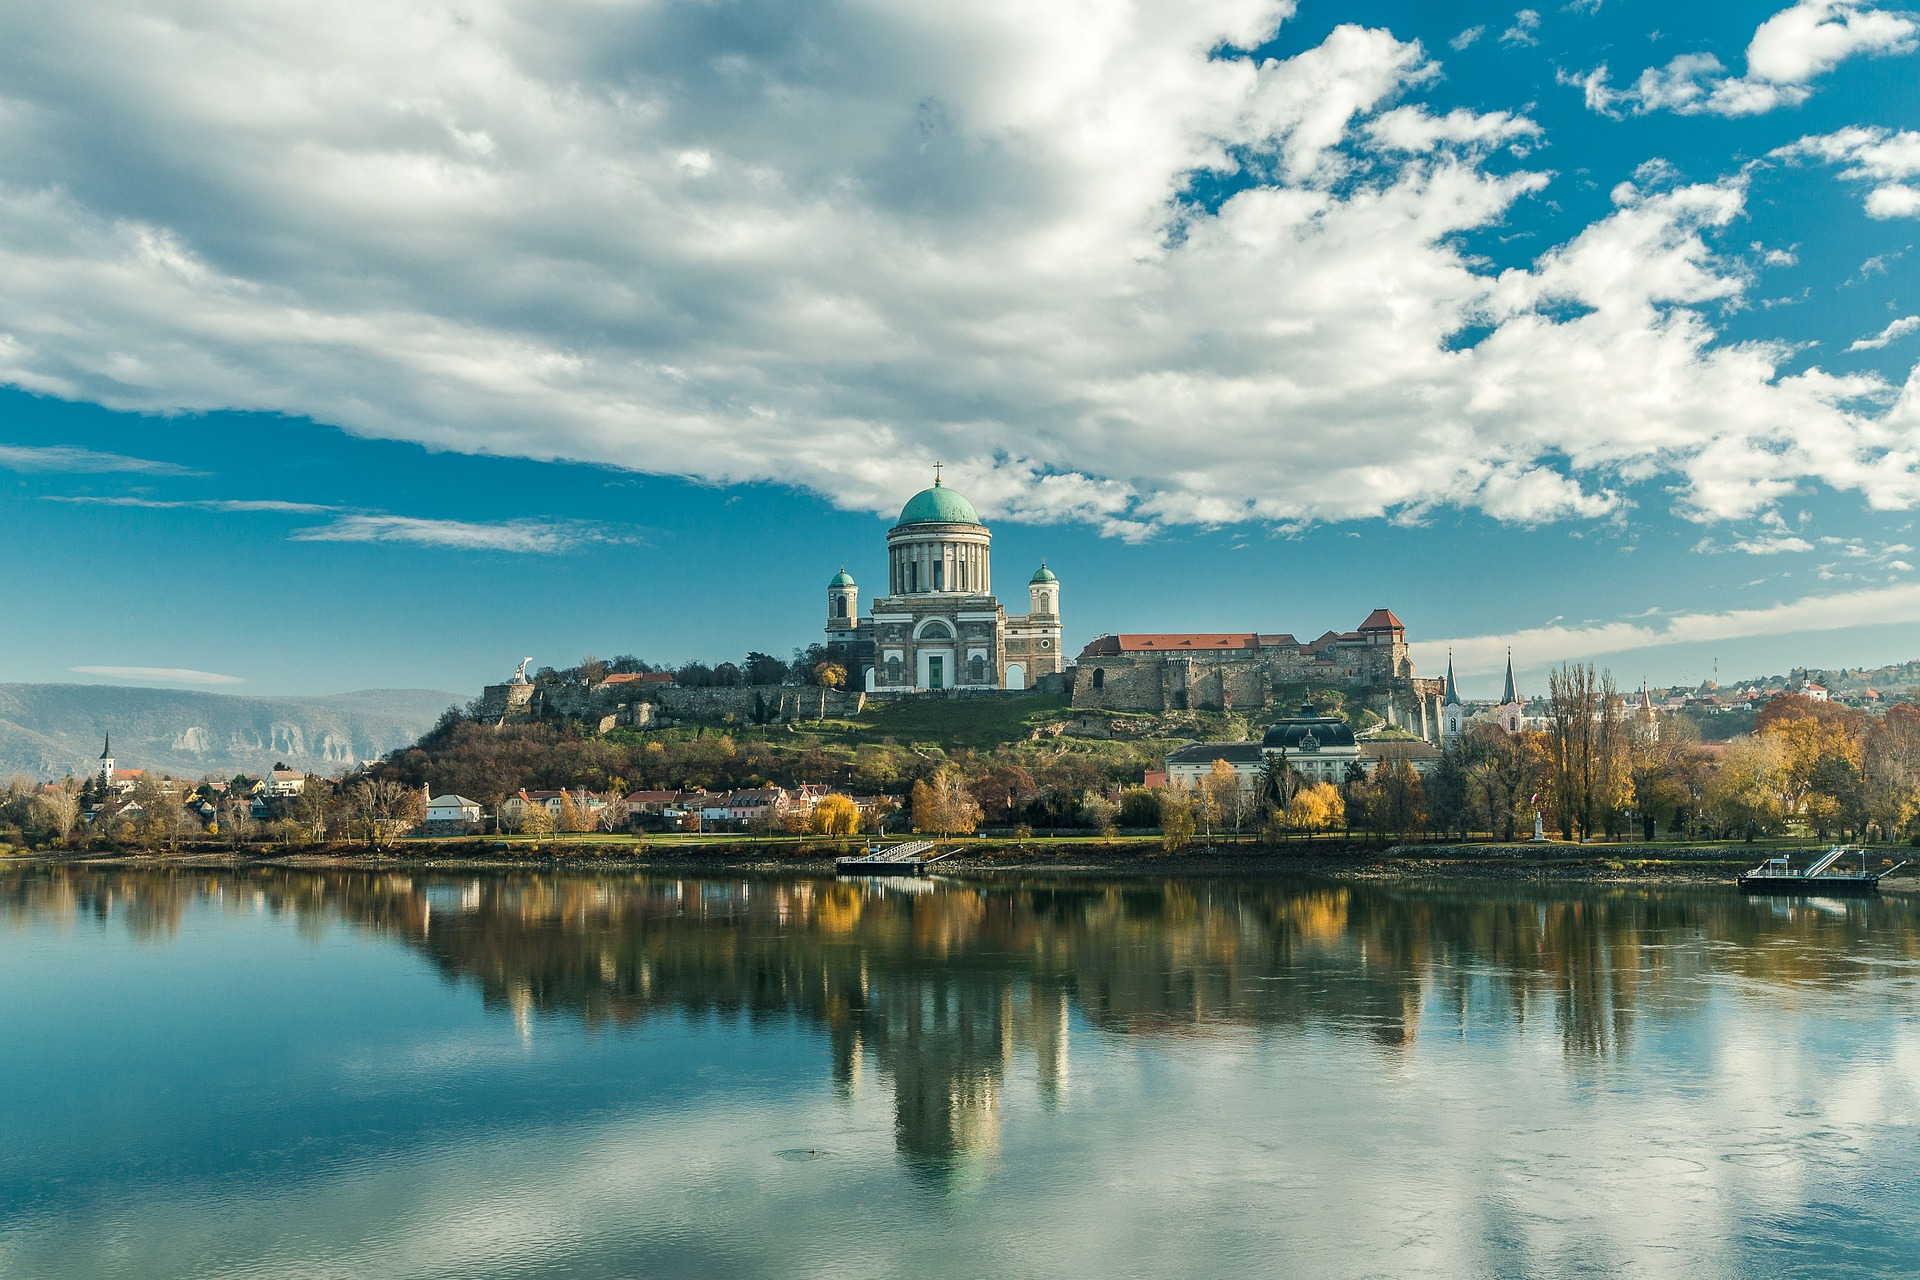 Esztergom capitale religieuse de la Hongrie (c)  Gábor Bejó de Pixabay